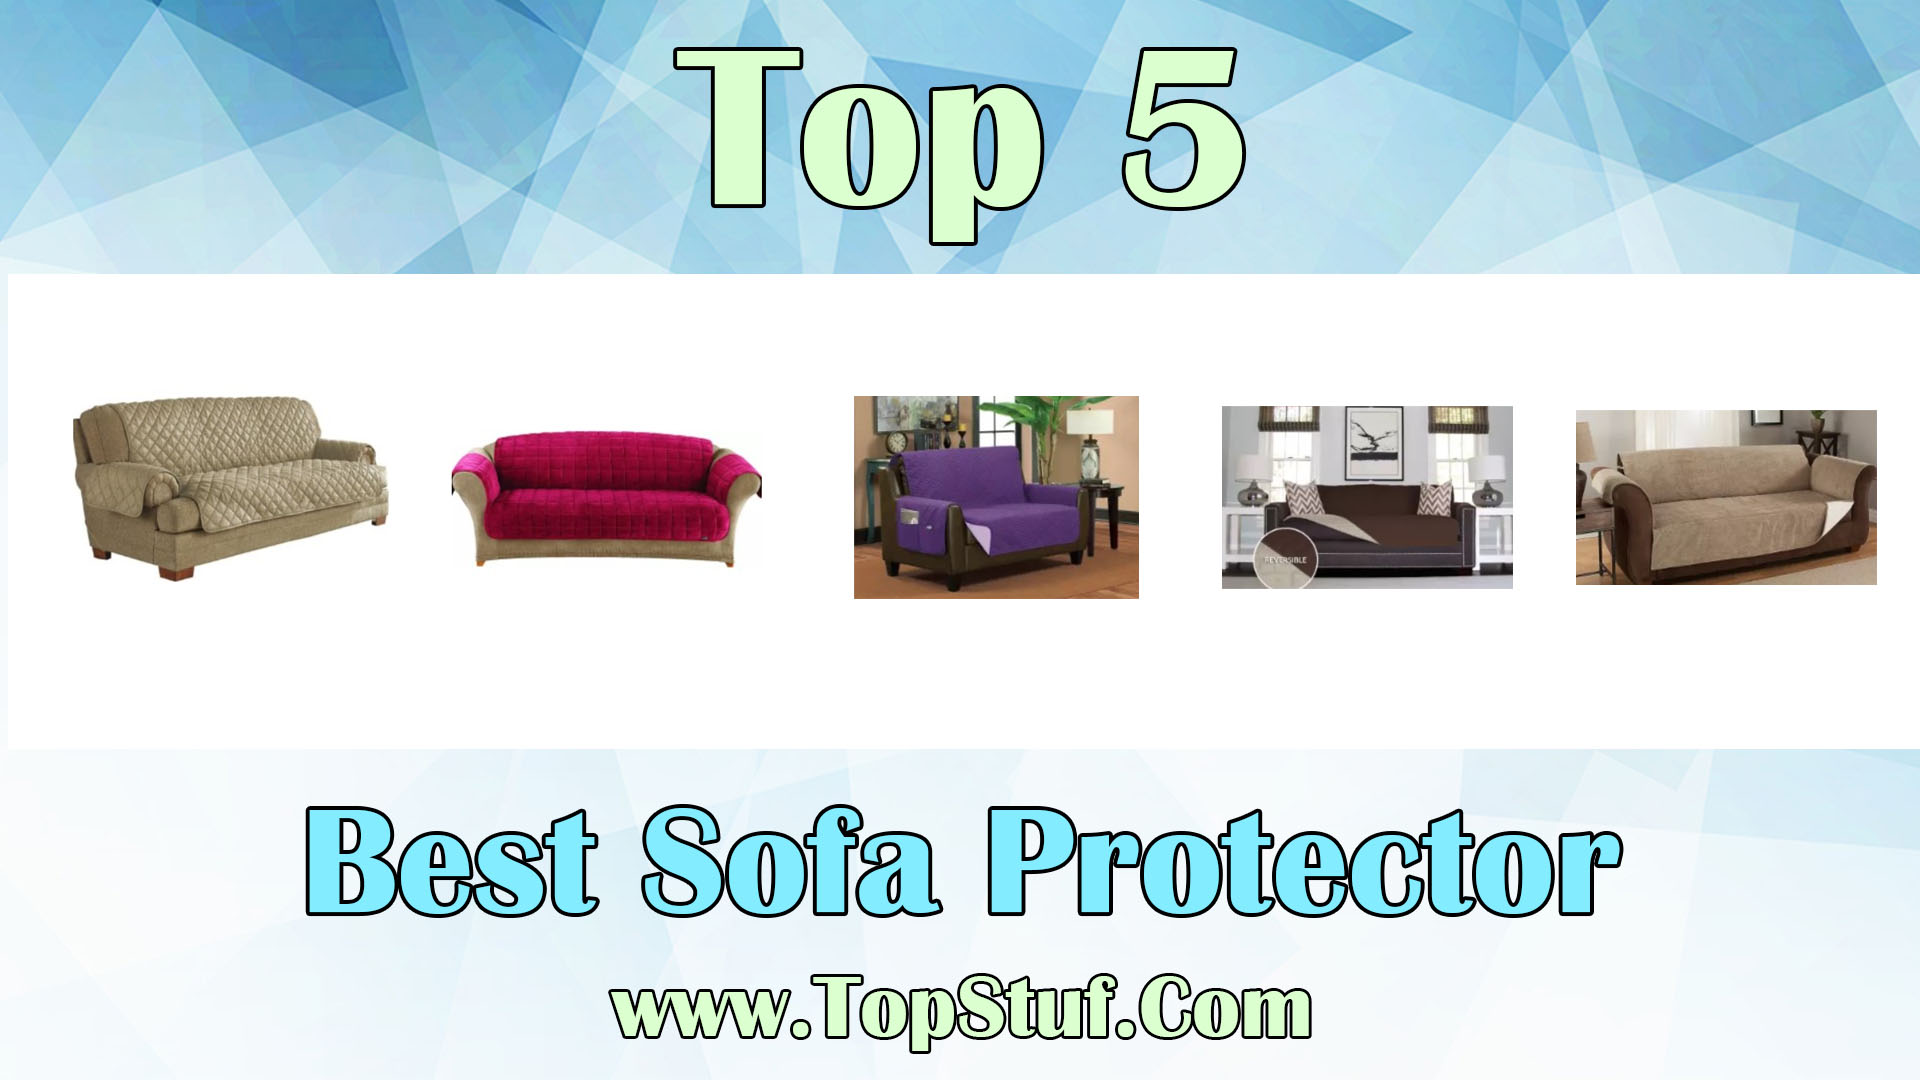 Best Sofa Protector